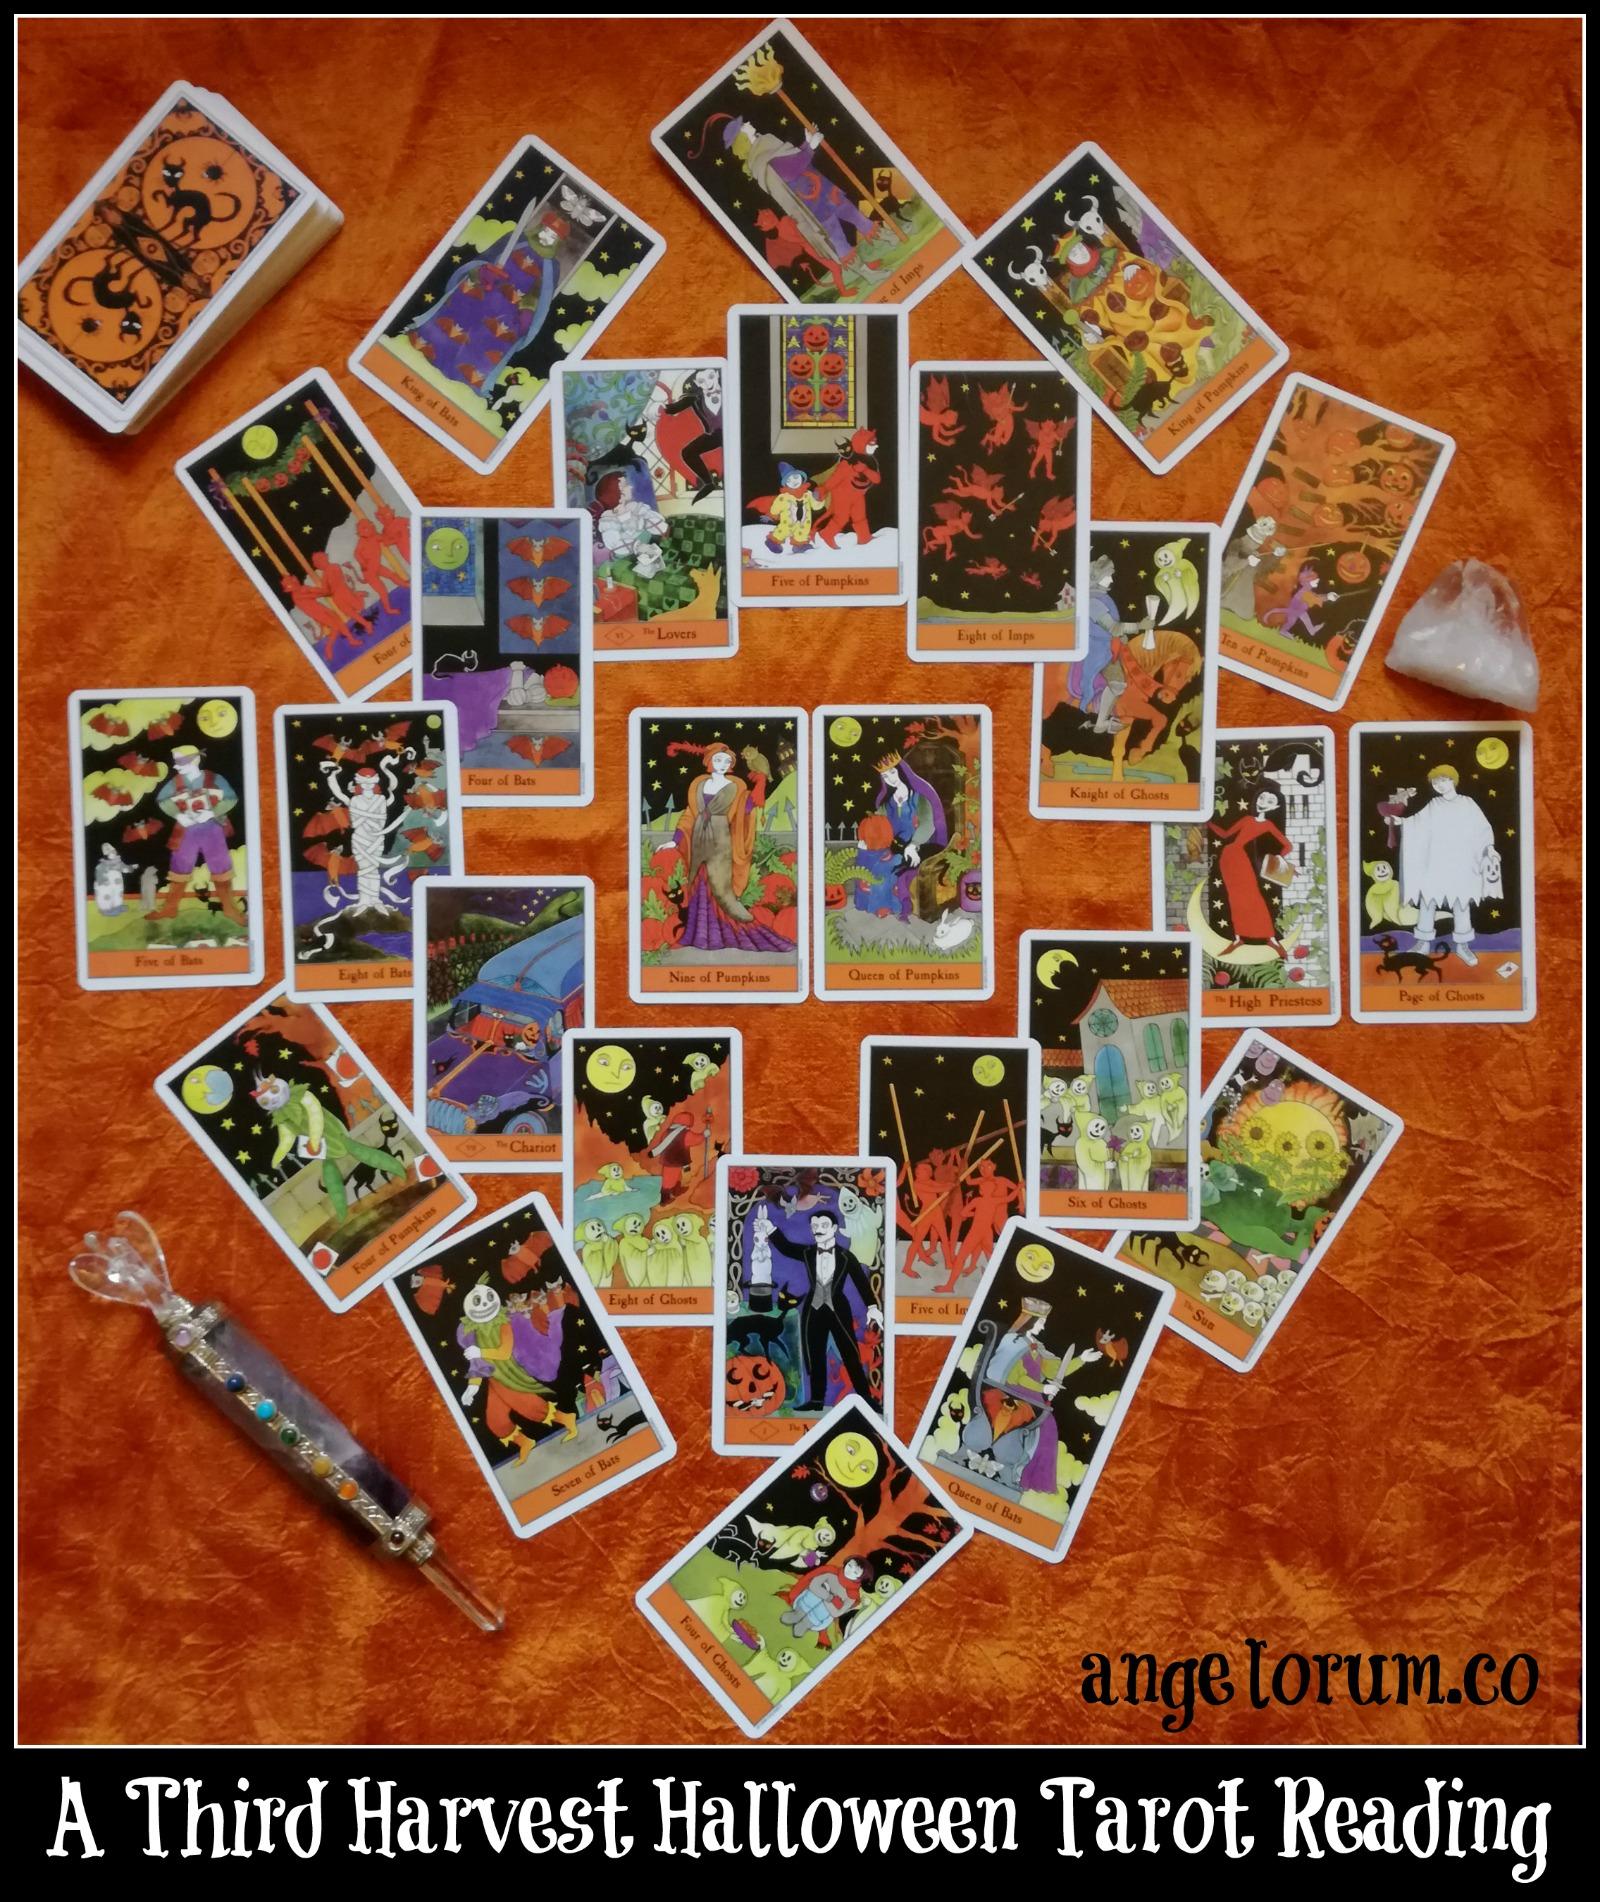 A Third Harvest Halloween Tarot Reading